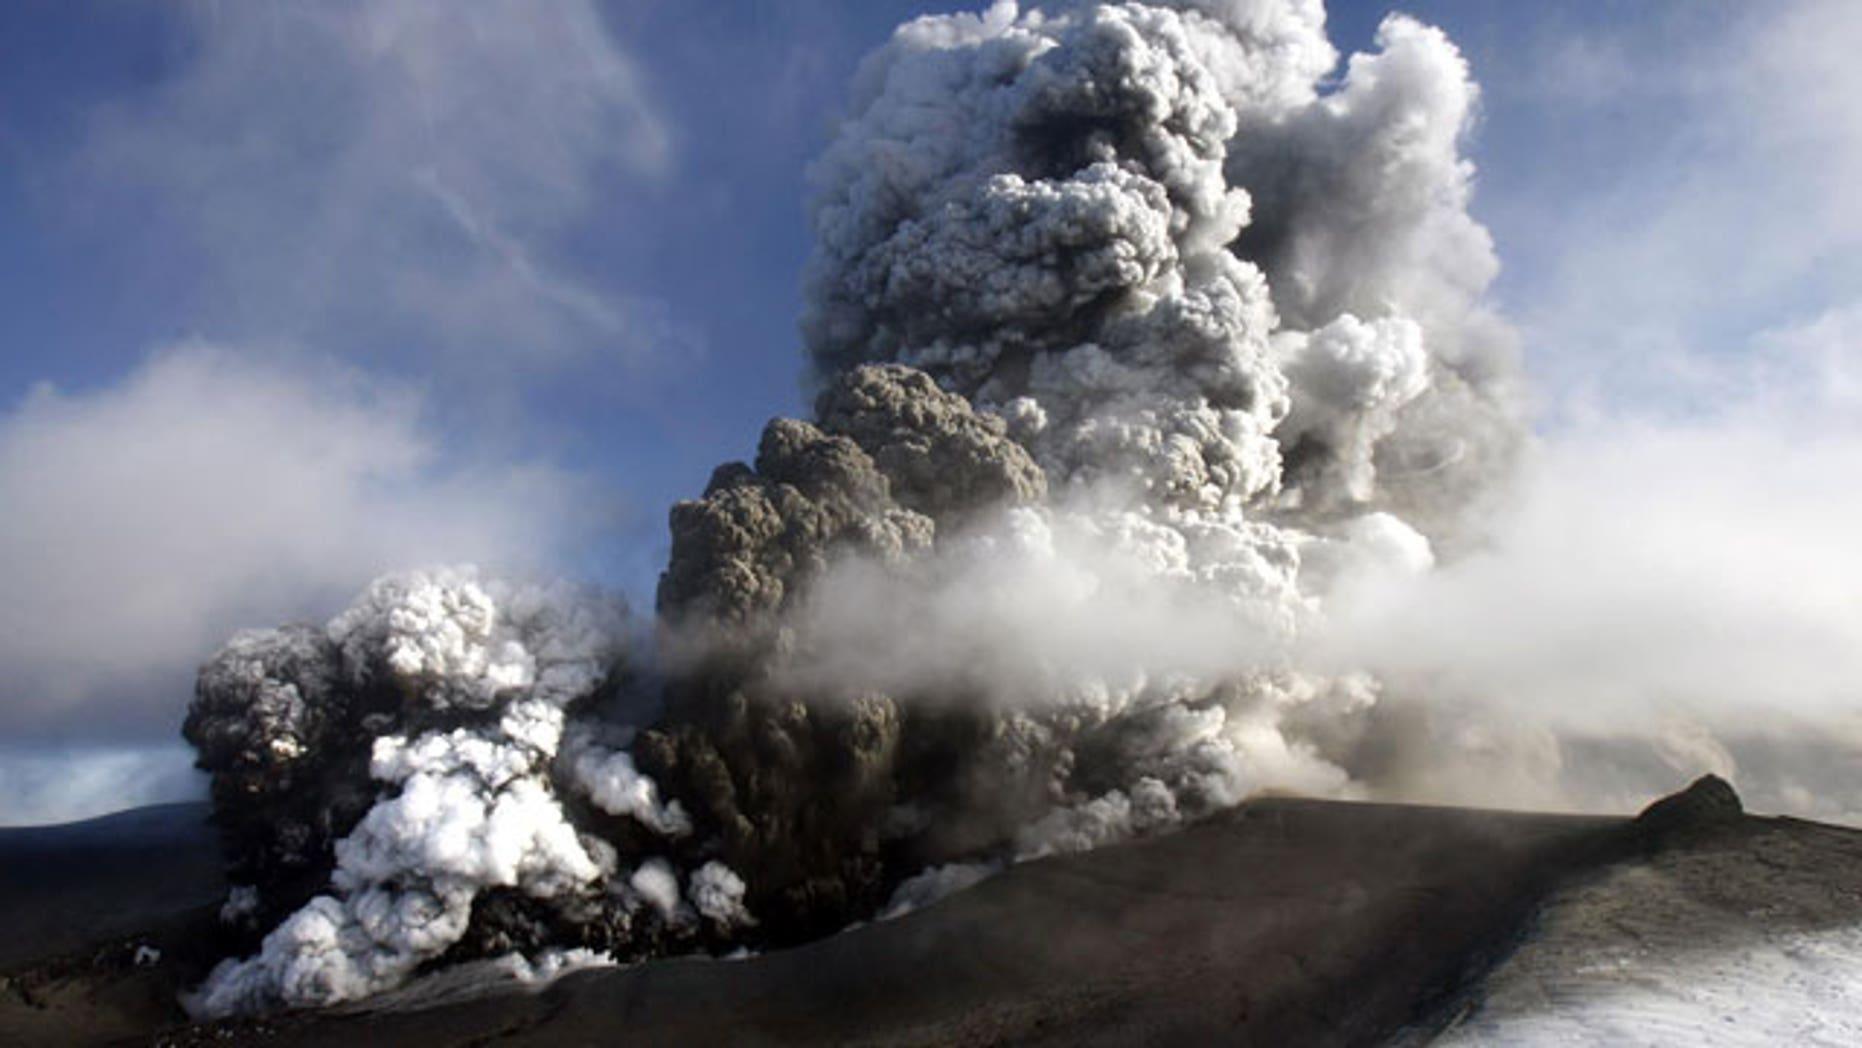 April 17, 2011: Volcano in southern Iceland's Eyjafjallajokull glacier sends ash into the air.